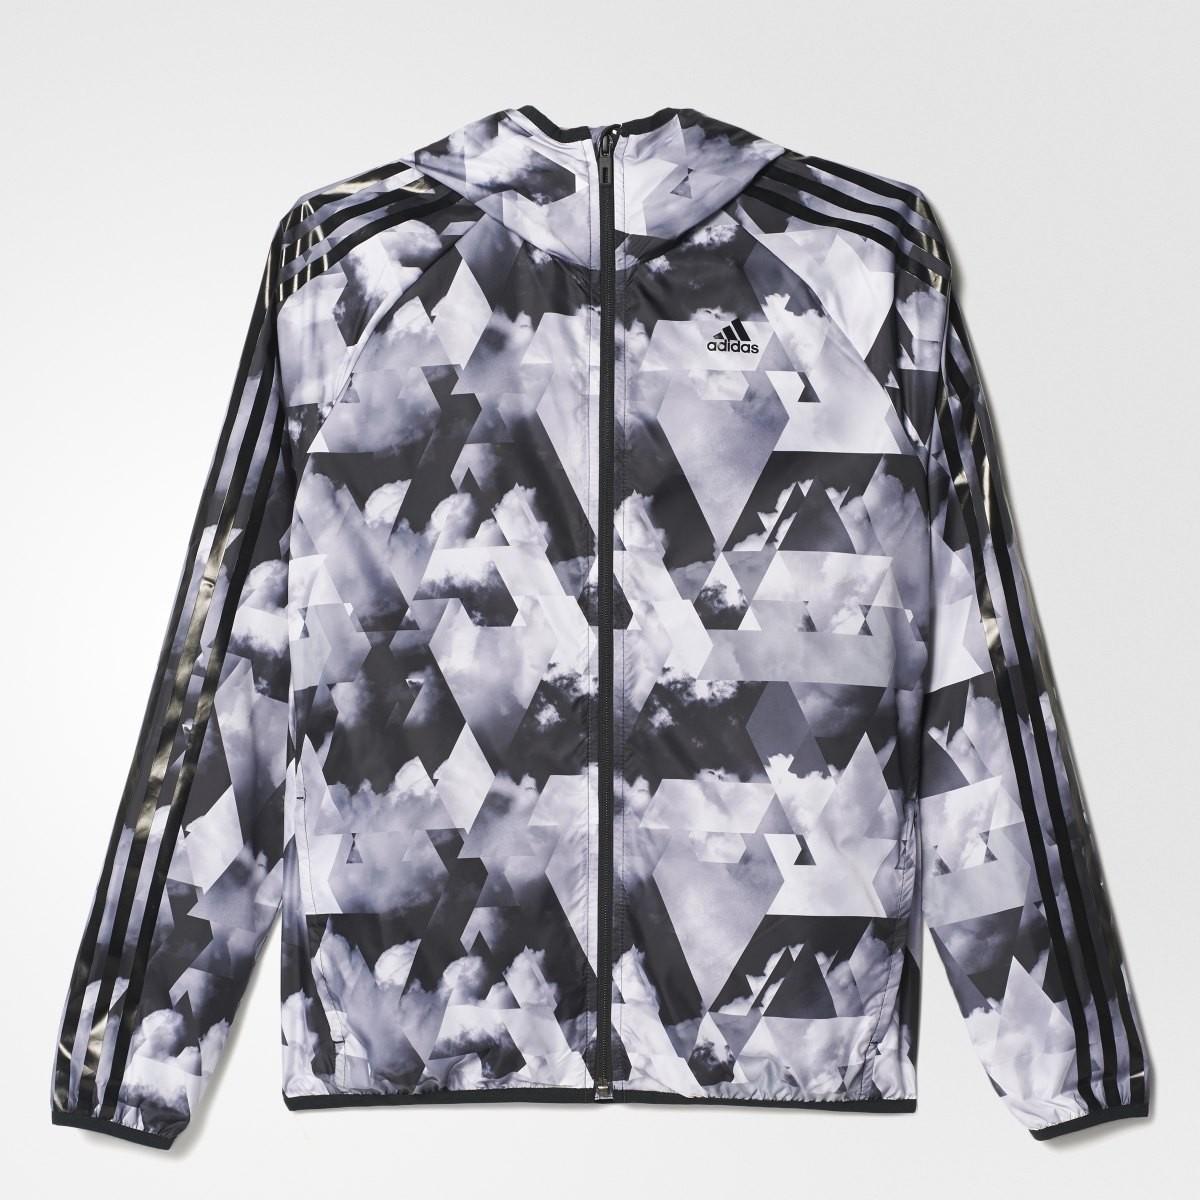 Dámská bunda adidas 3 STRIPE WB